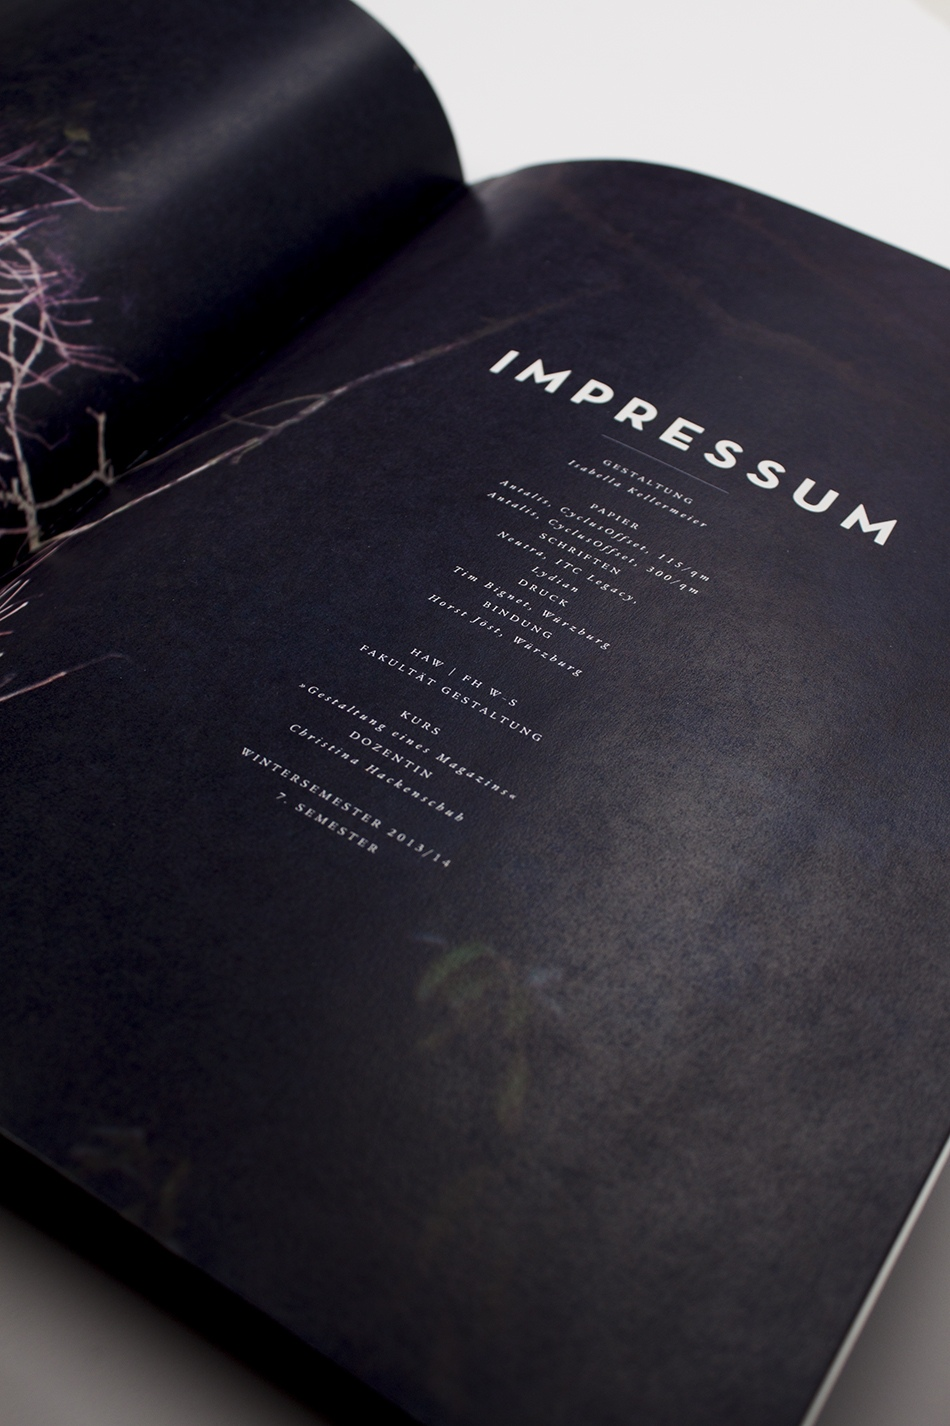 SCOPE Magazine_Isabella Kellermeier34